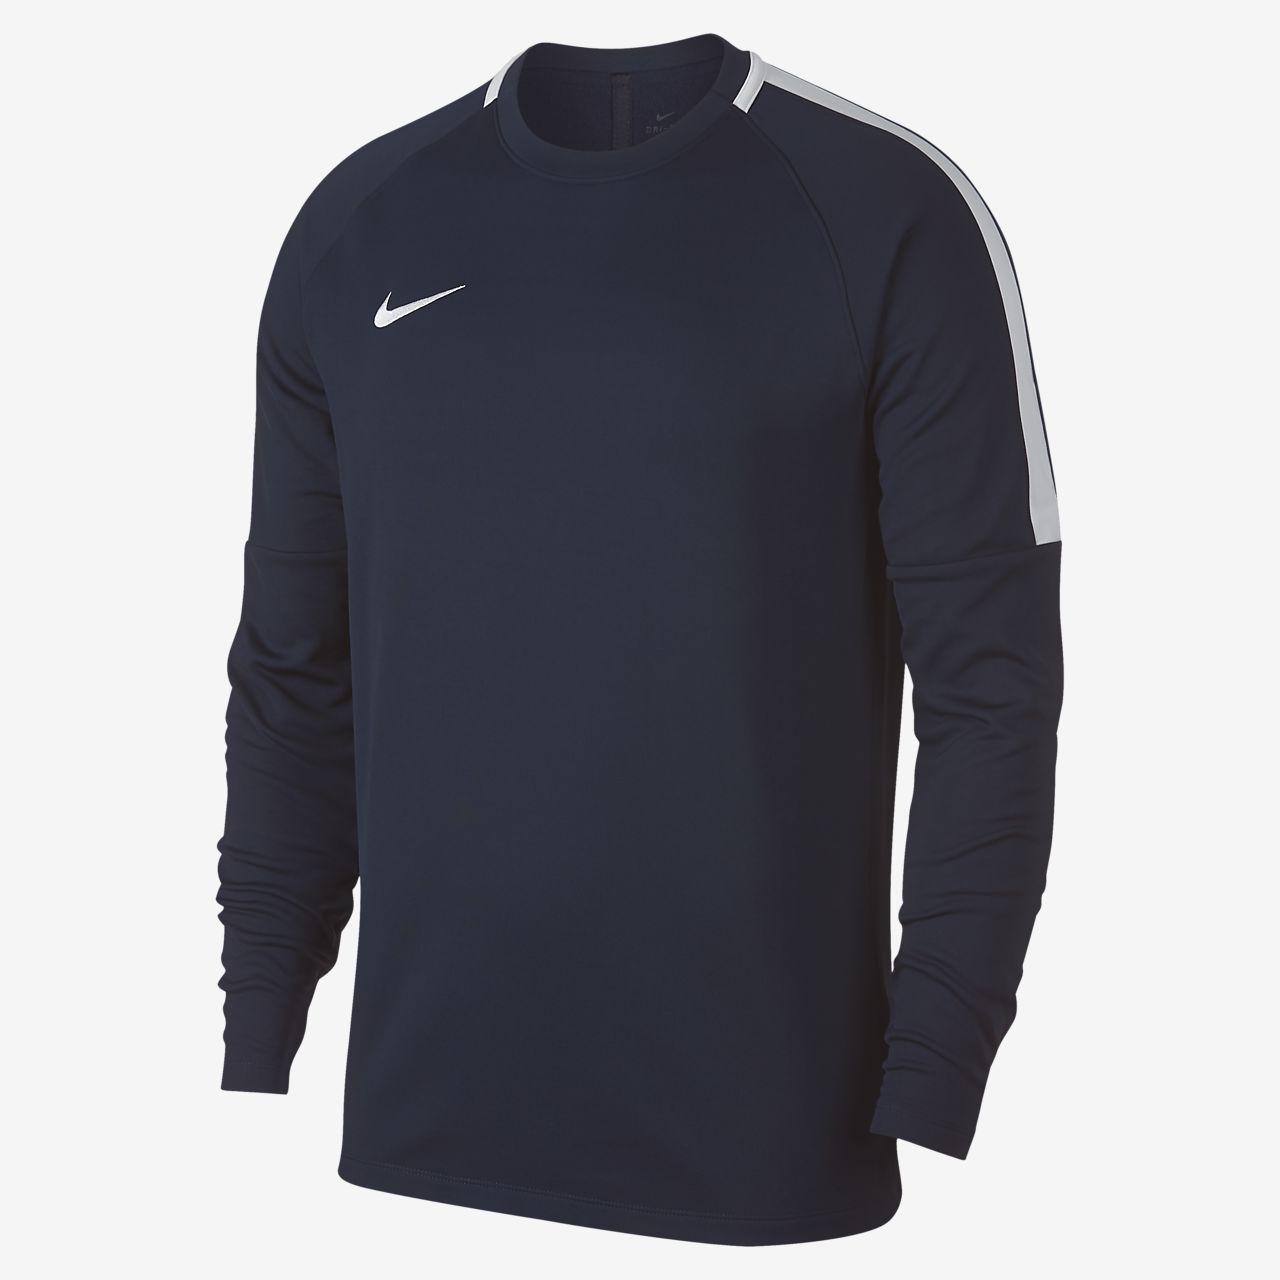 Nike Dri-FIT Academy-fodboldsweatshirt til mænd